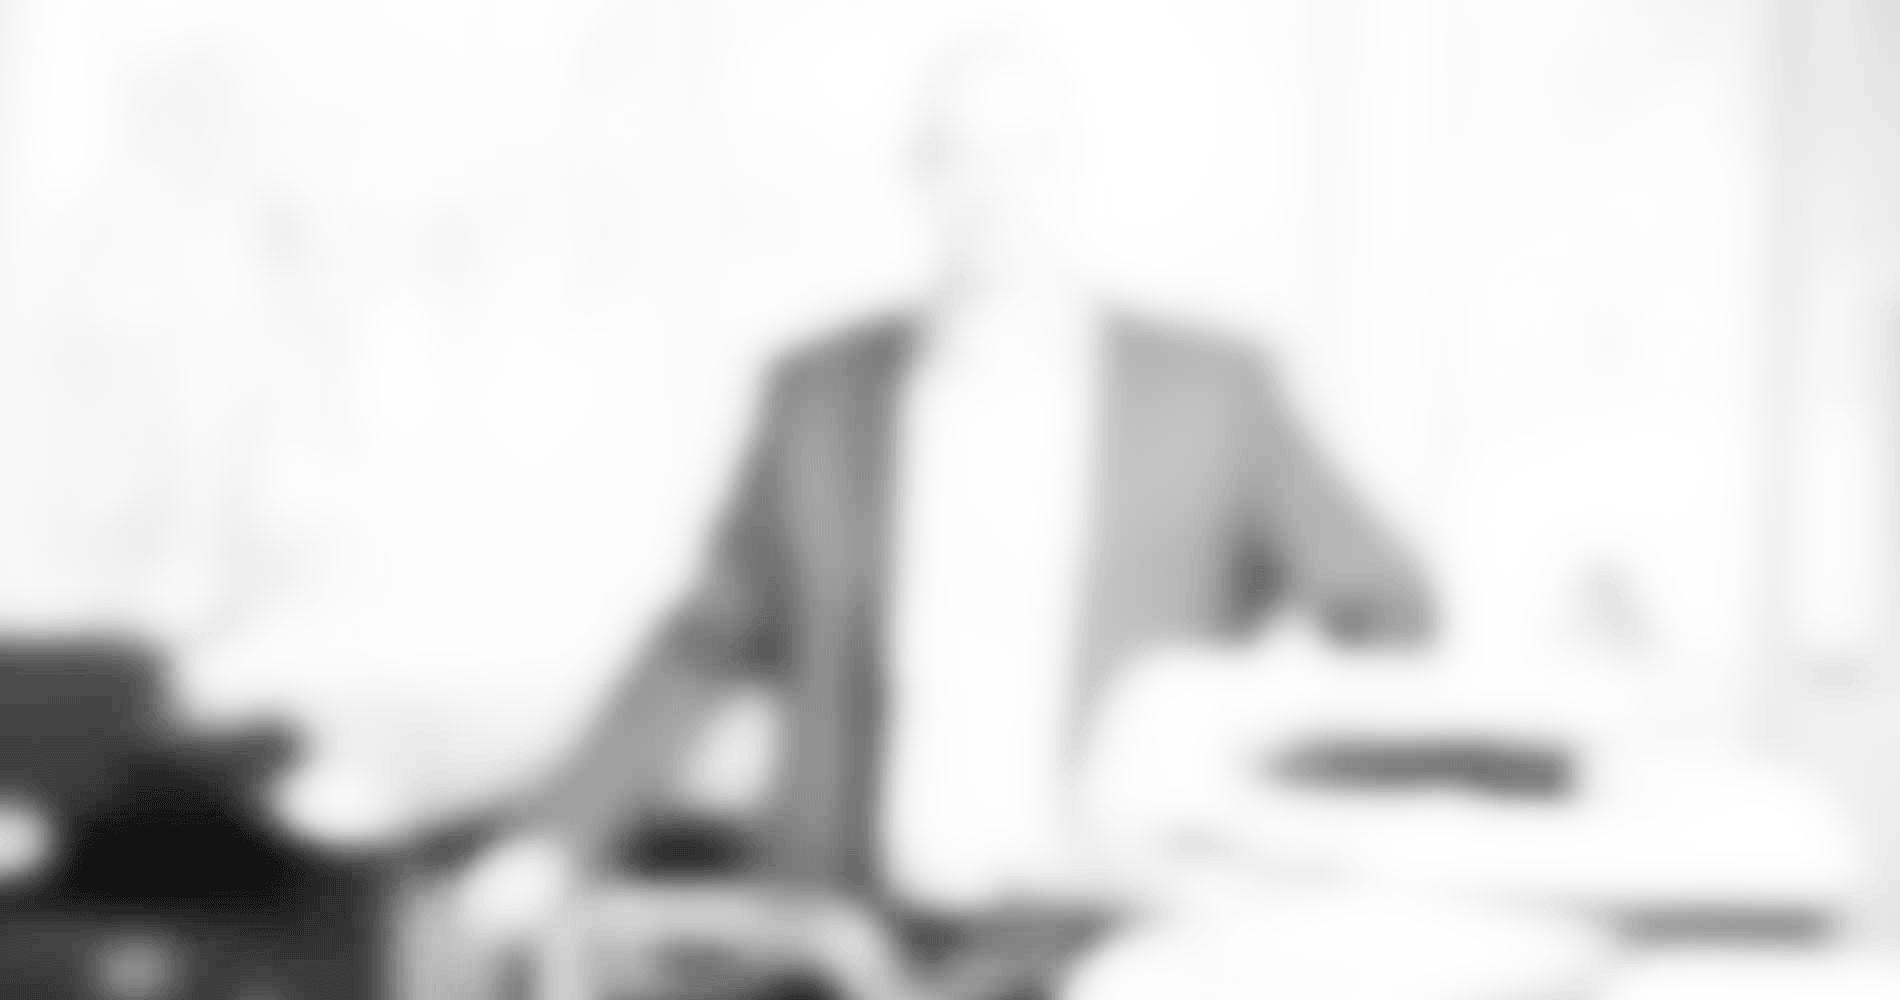 techwolkigbggray - Bürotechnik